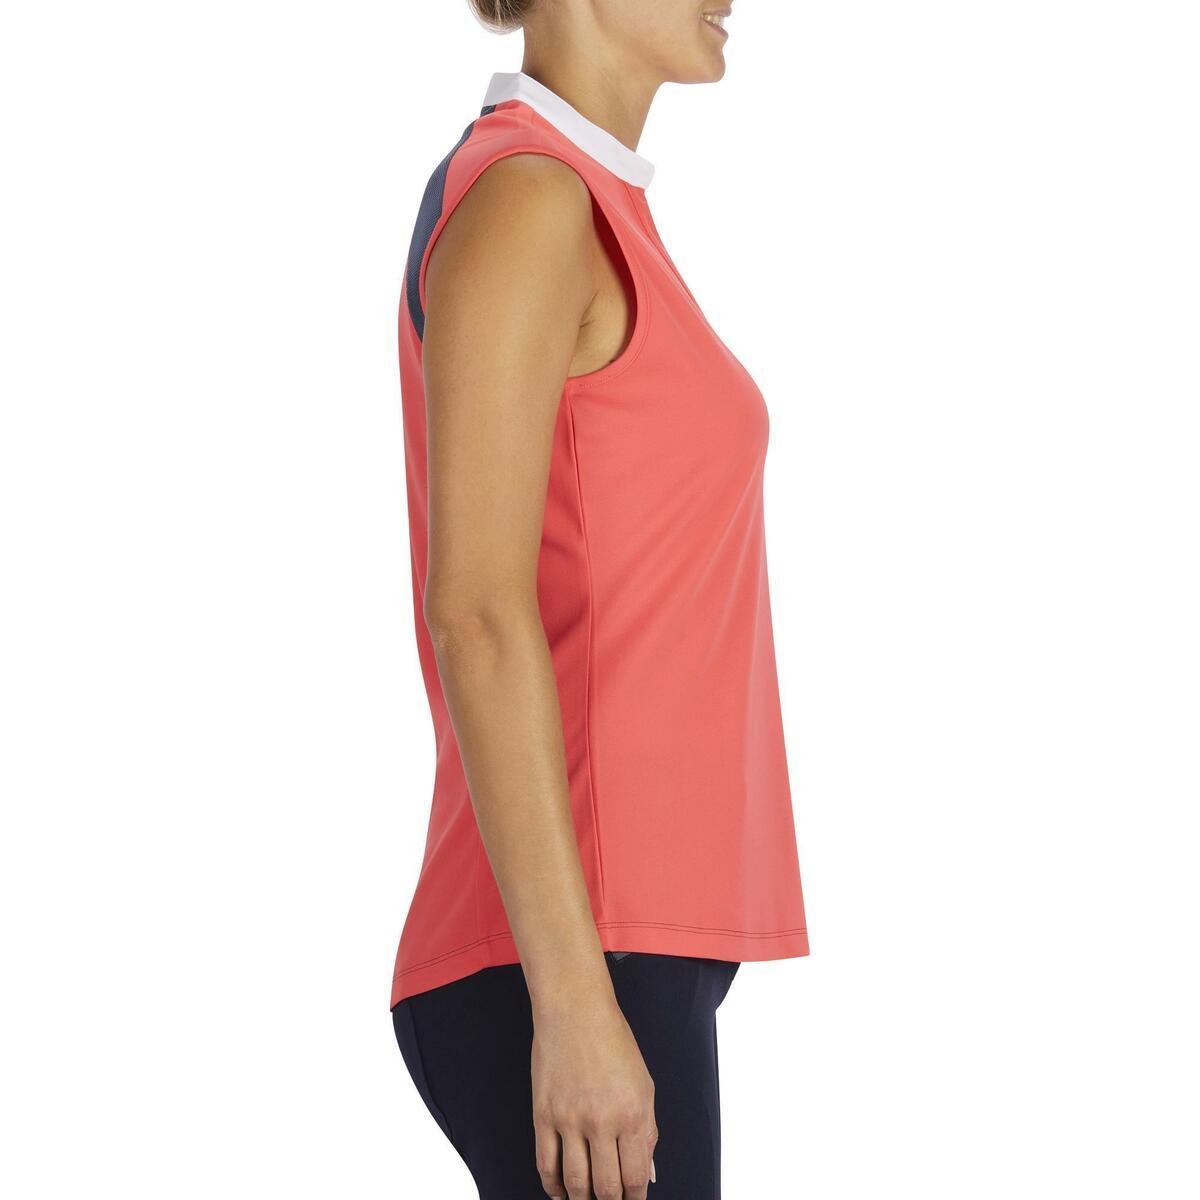 Bild 3 von Reit-Top 500 Mesh Damen rosa/grau